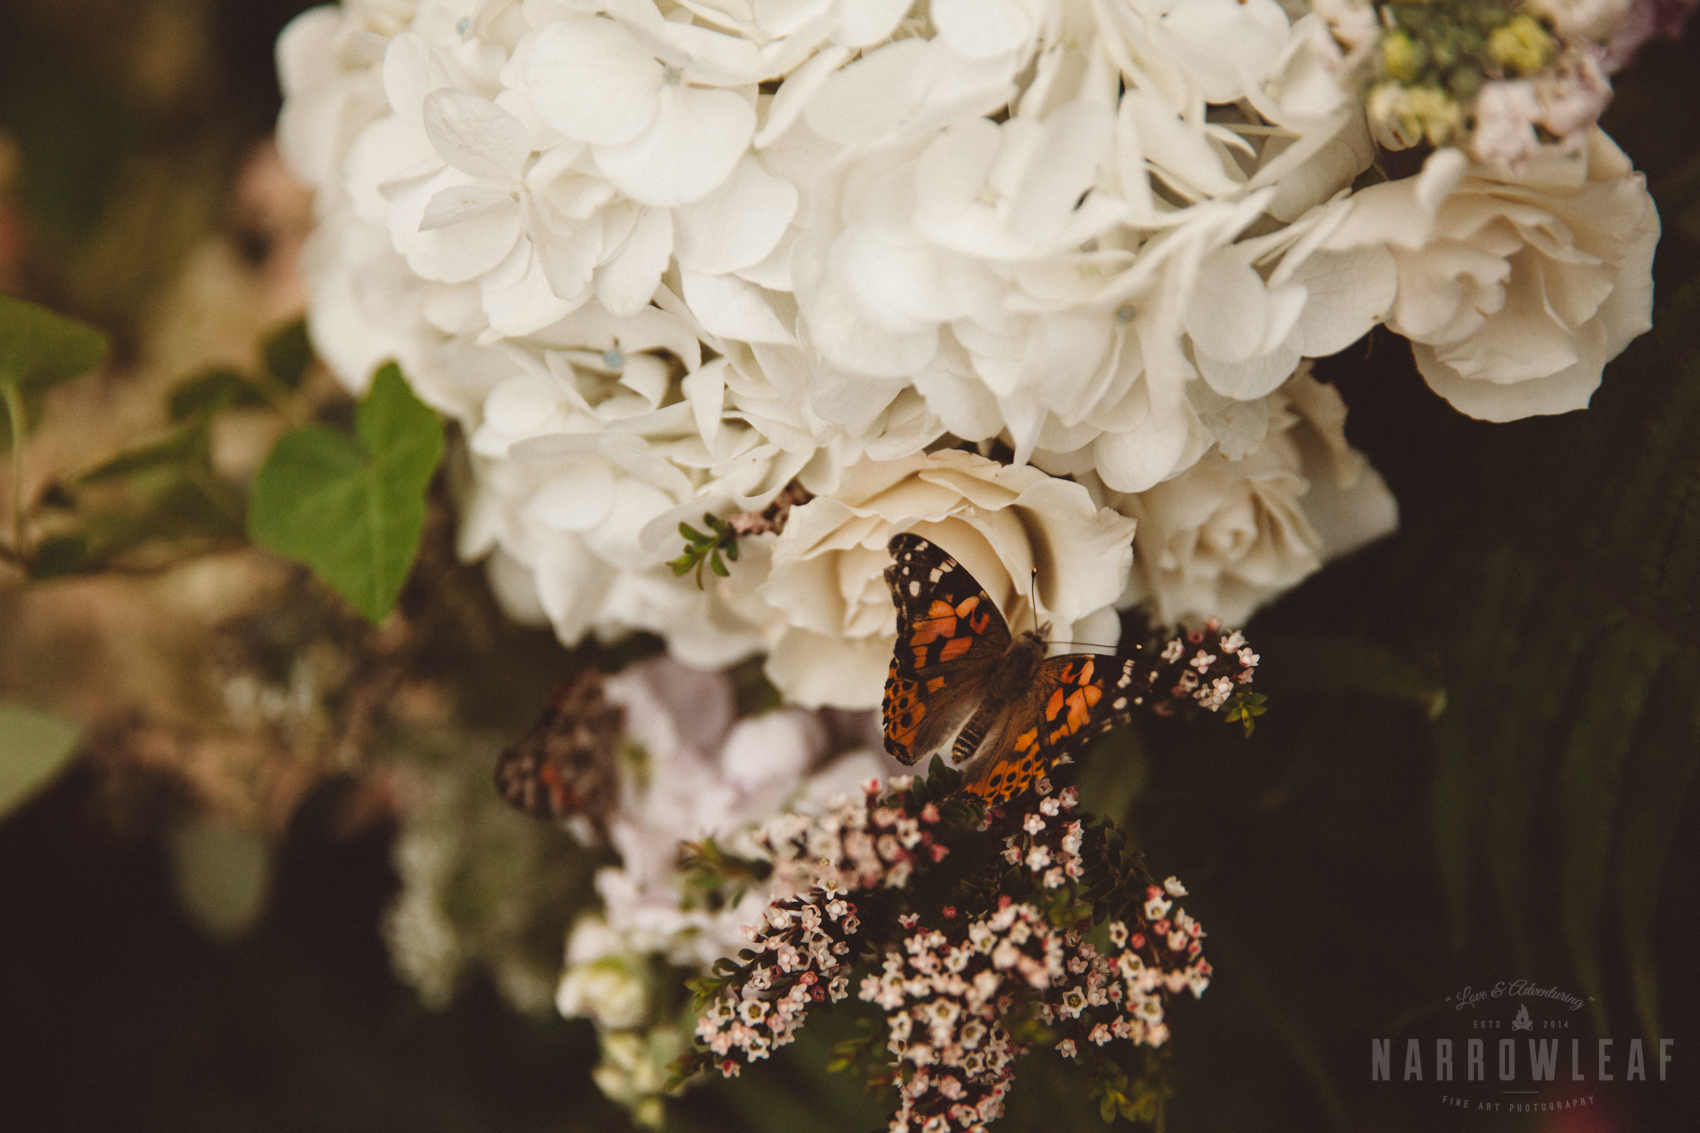 NarrowLeaf_Love_&_Adventure_Photography-8560.jpg